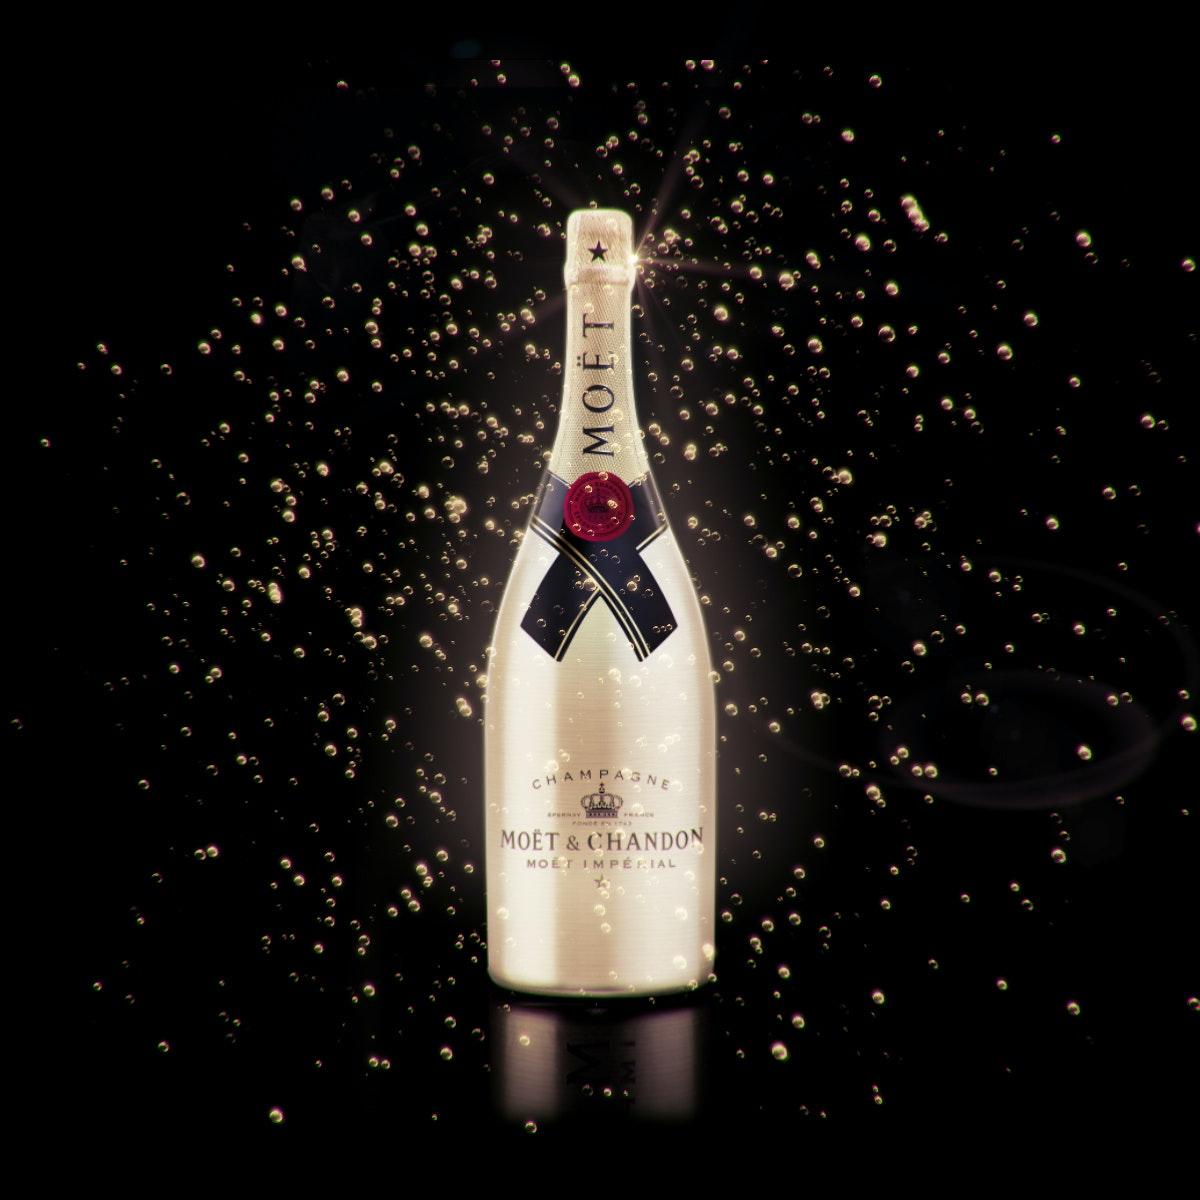 3D champagne bottle with bubbles artwork